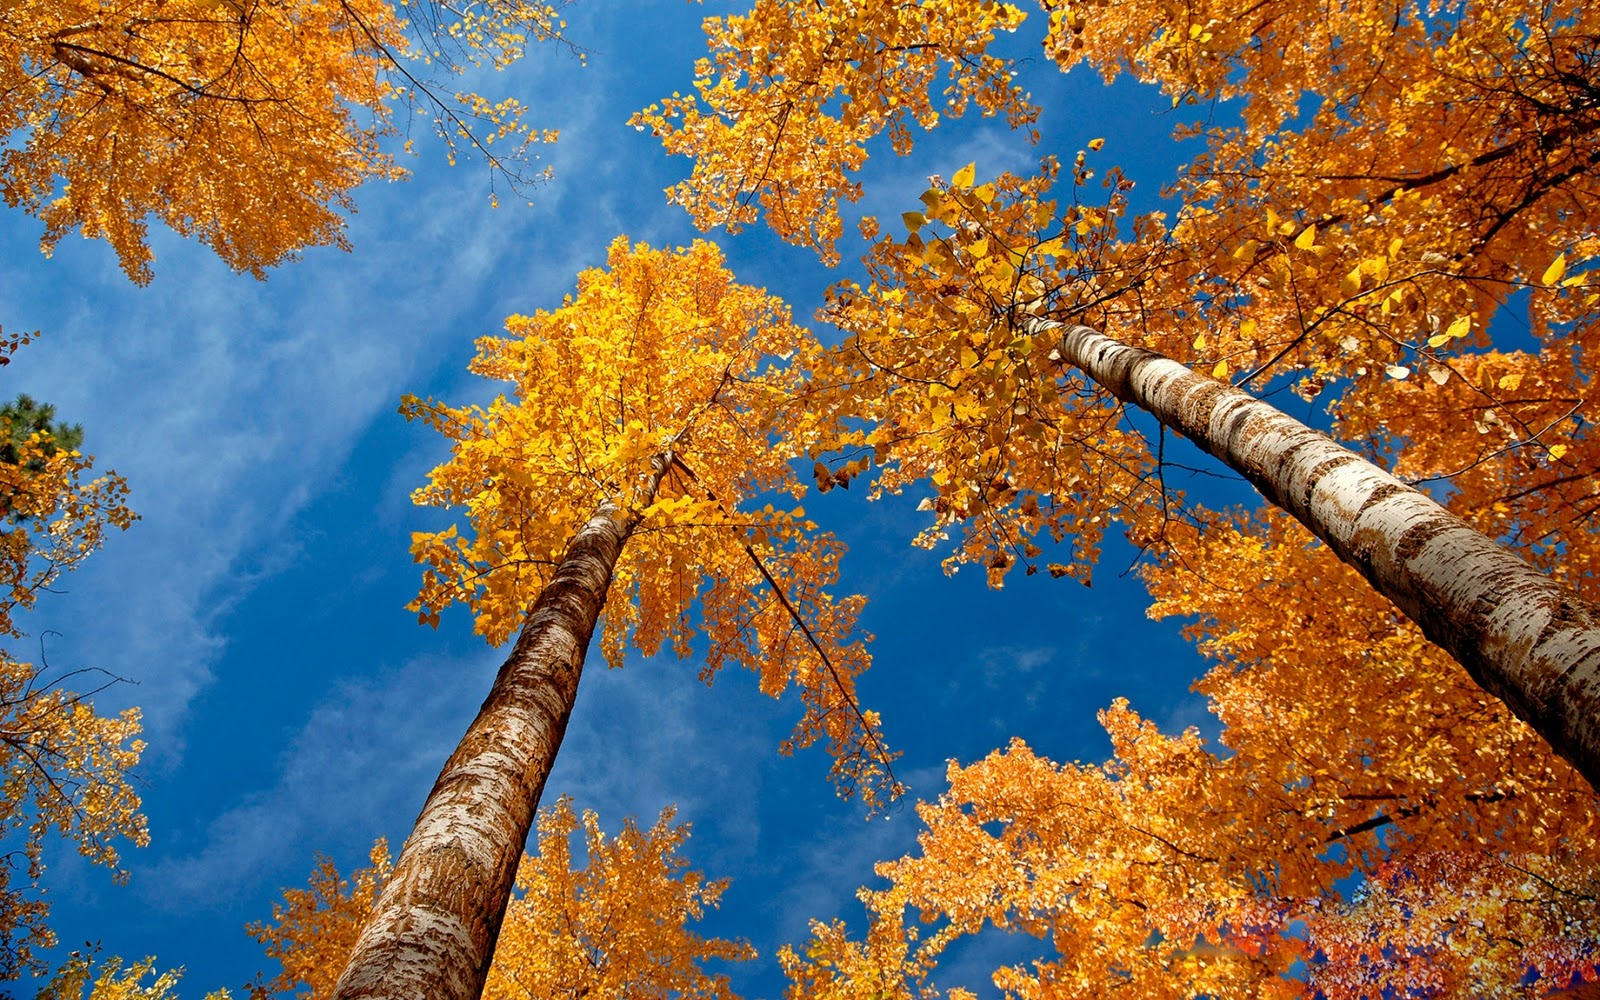 The best top autumn desktop wallpapers 3 En Güzel Sonbahar HD Duvar Kağıtları